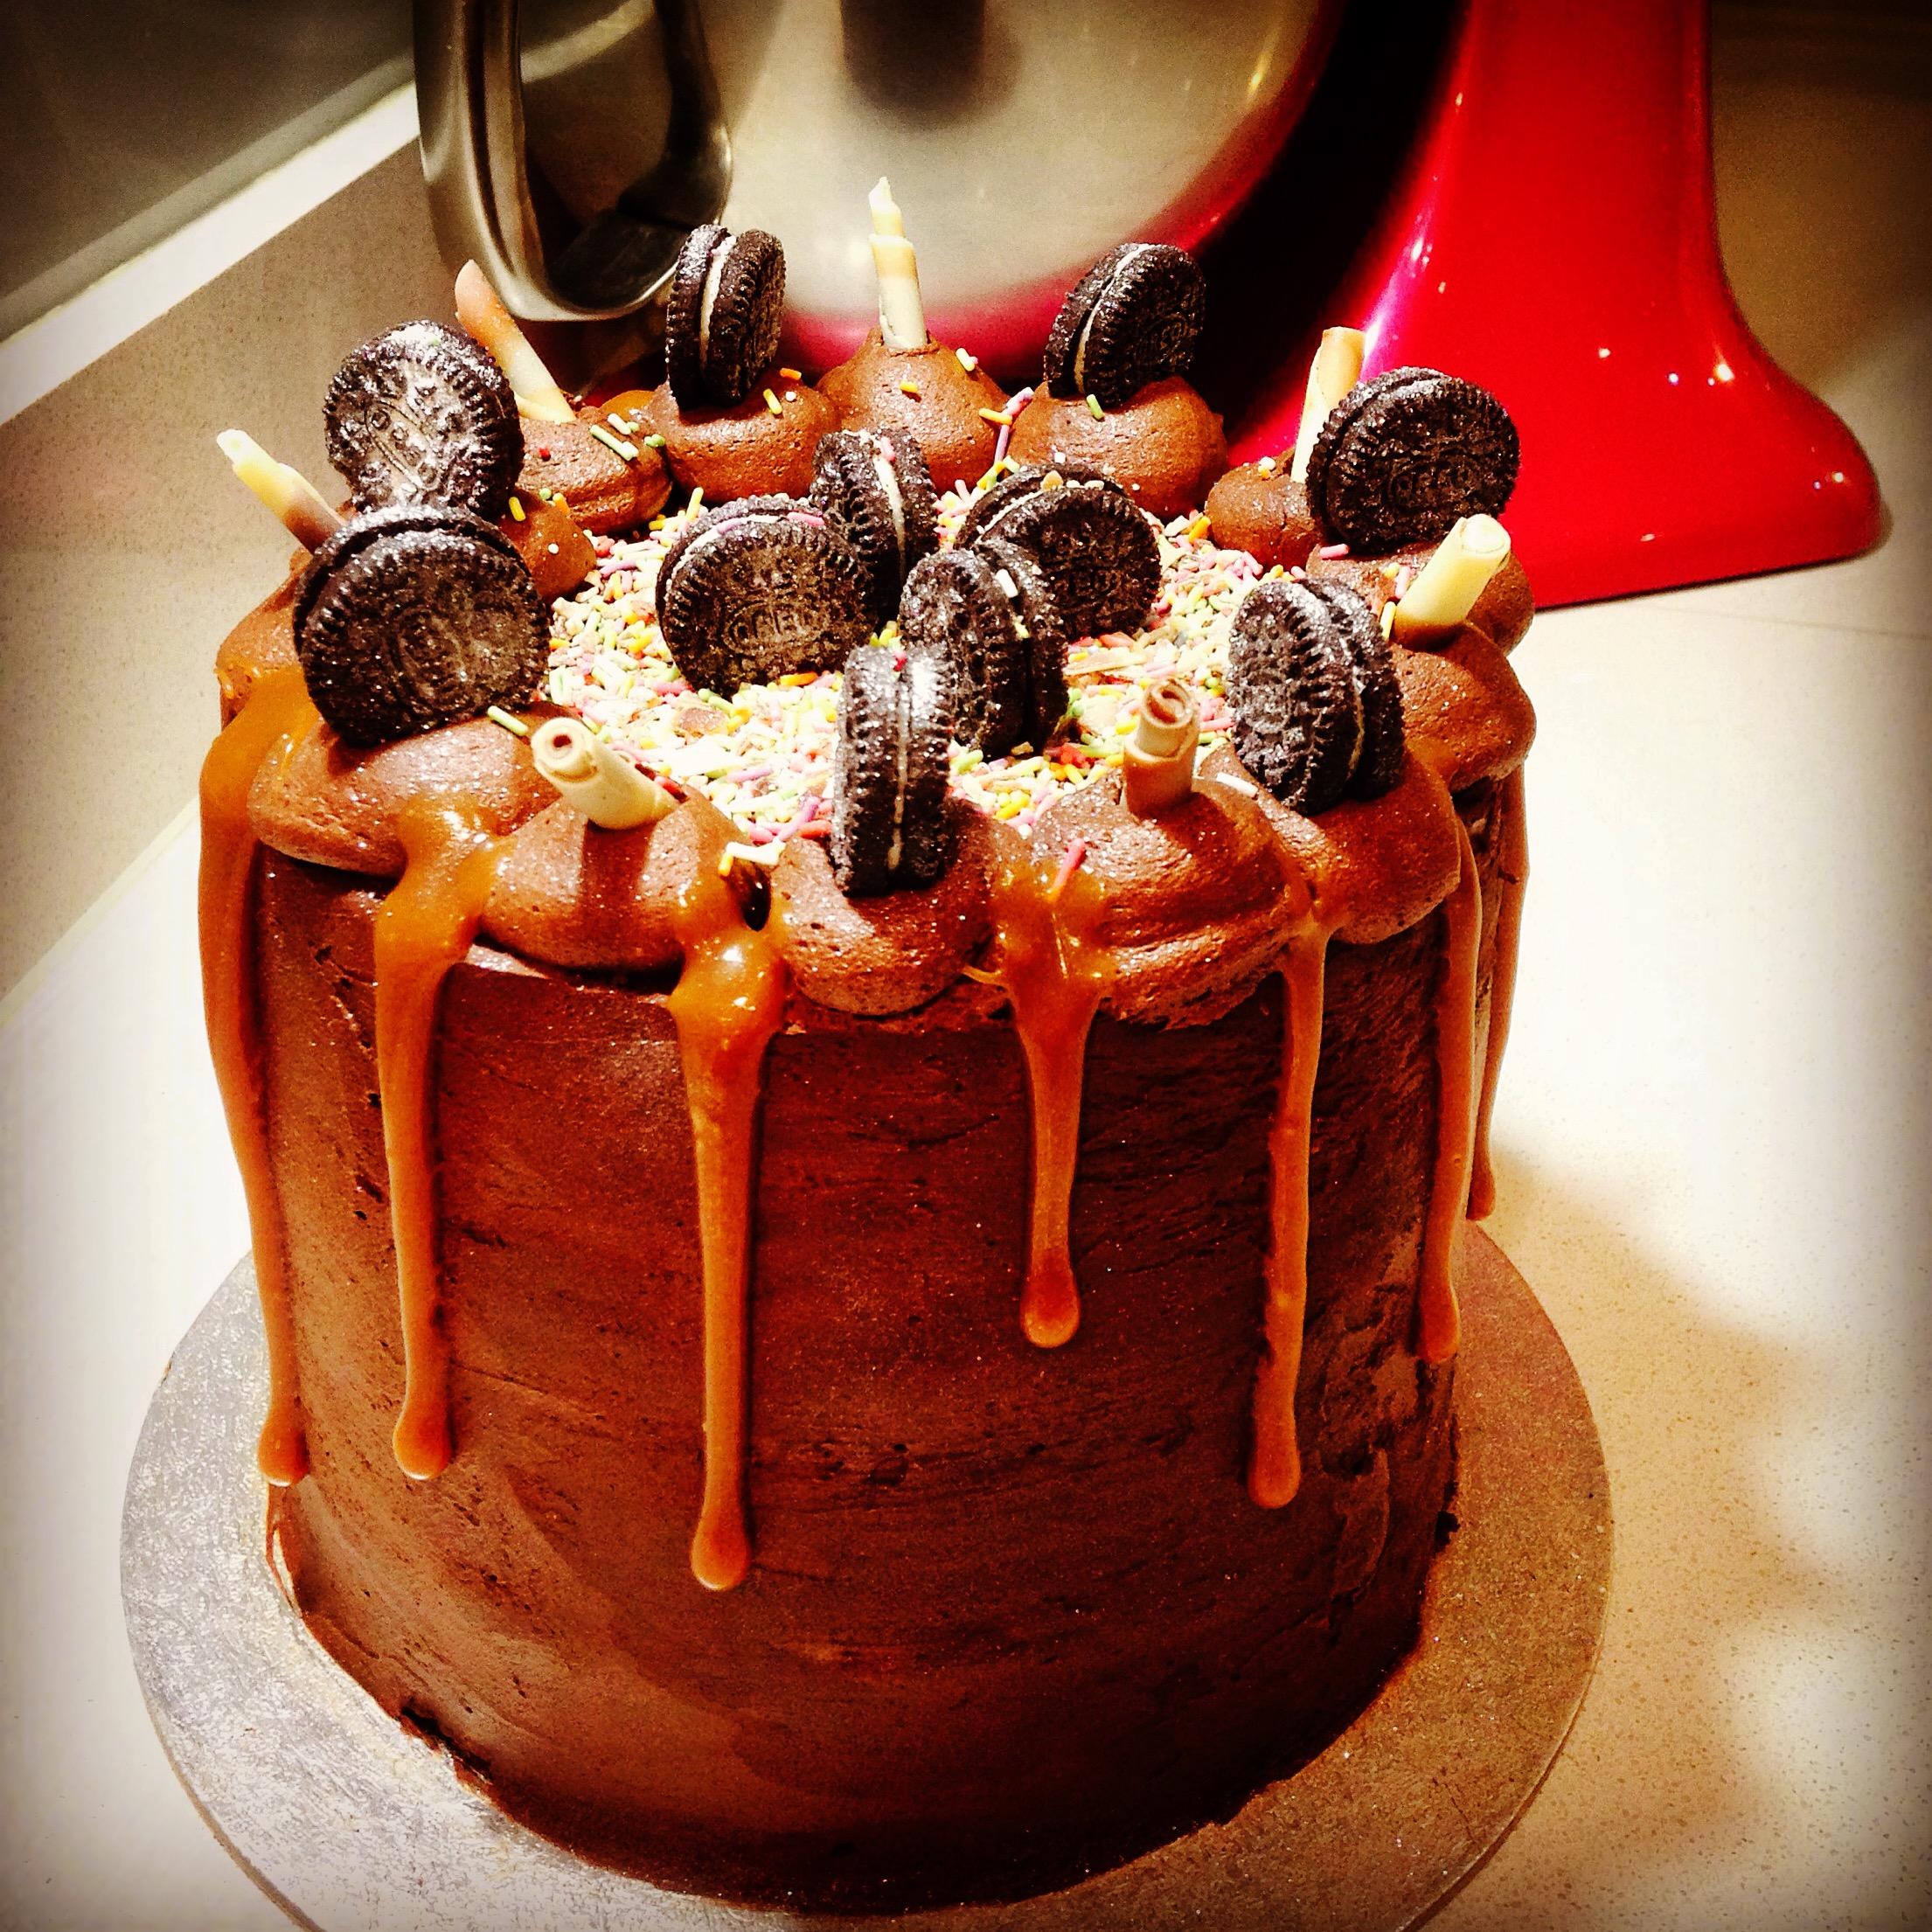 Chocolate, Salted Caramel, Oreo Cake